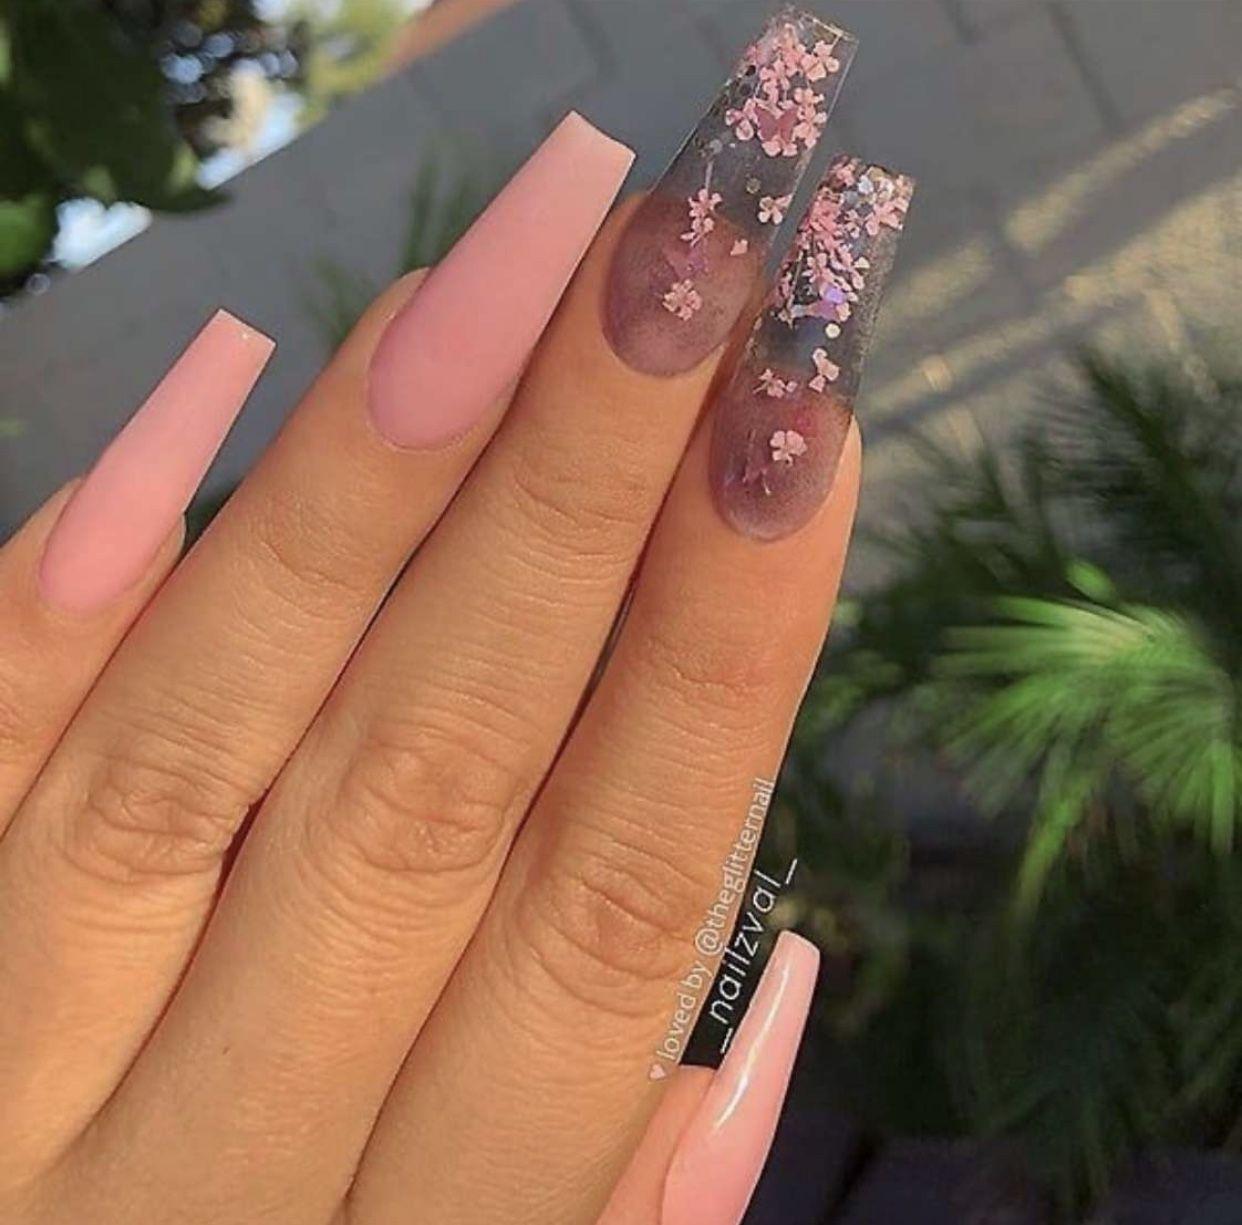 Pin By Lidia Kabacinska On Nails In 2020 Dlugie Paznokcie